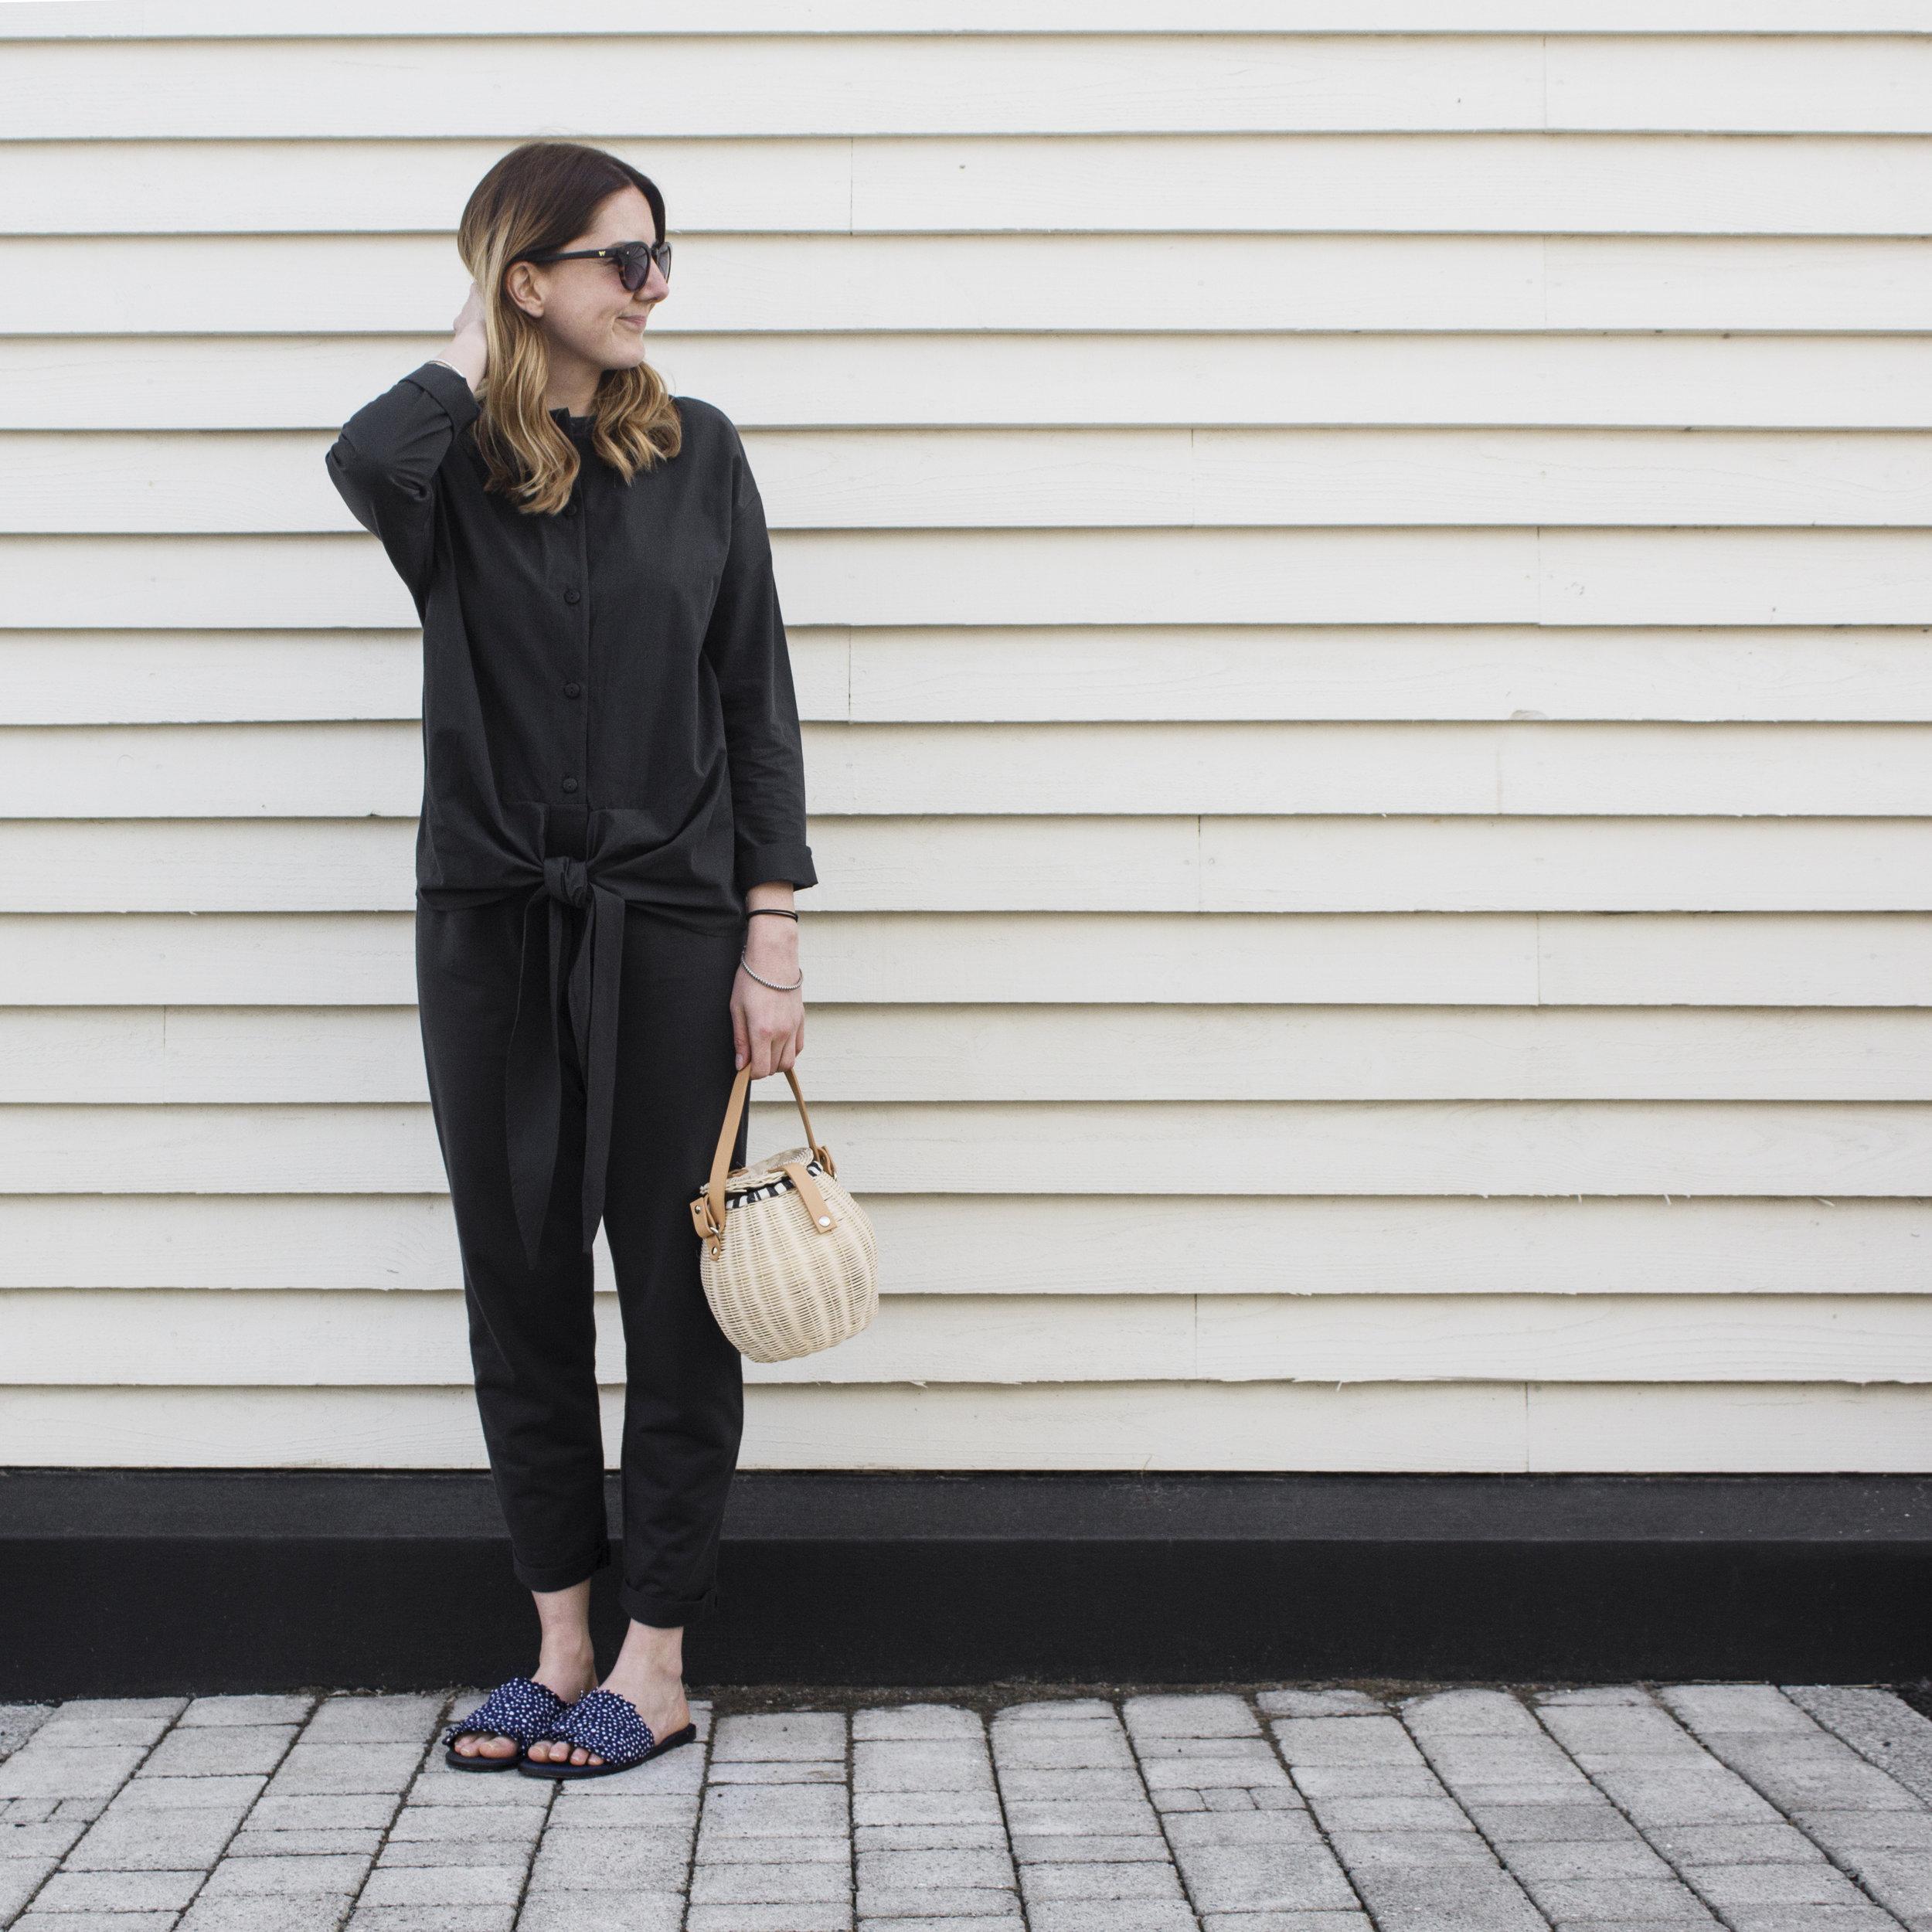 Spring Baskets Nicole Davidson Fashion Buyer